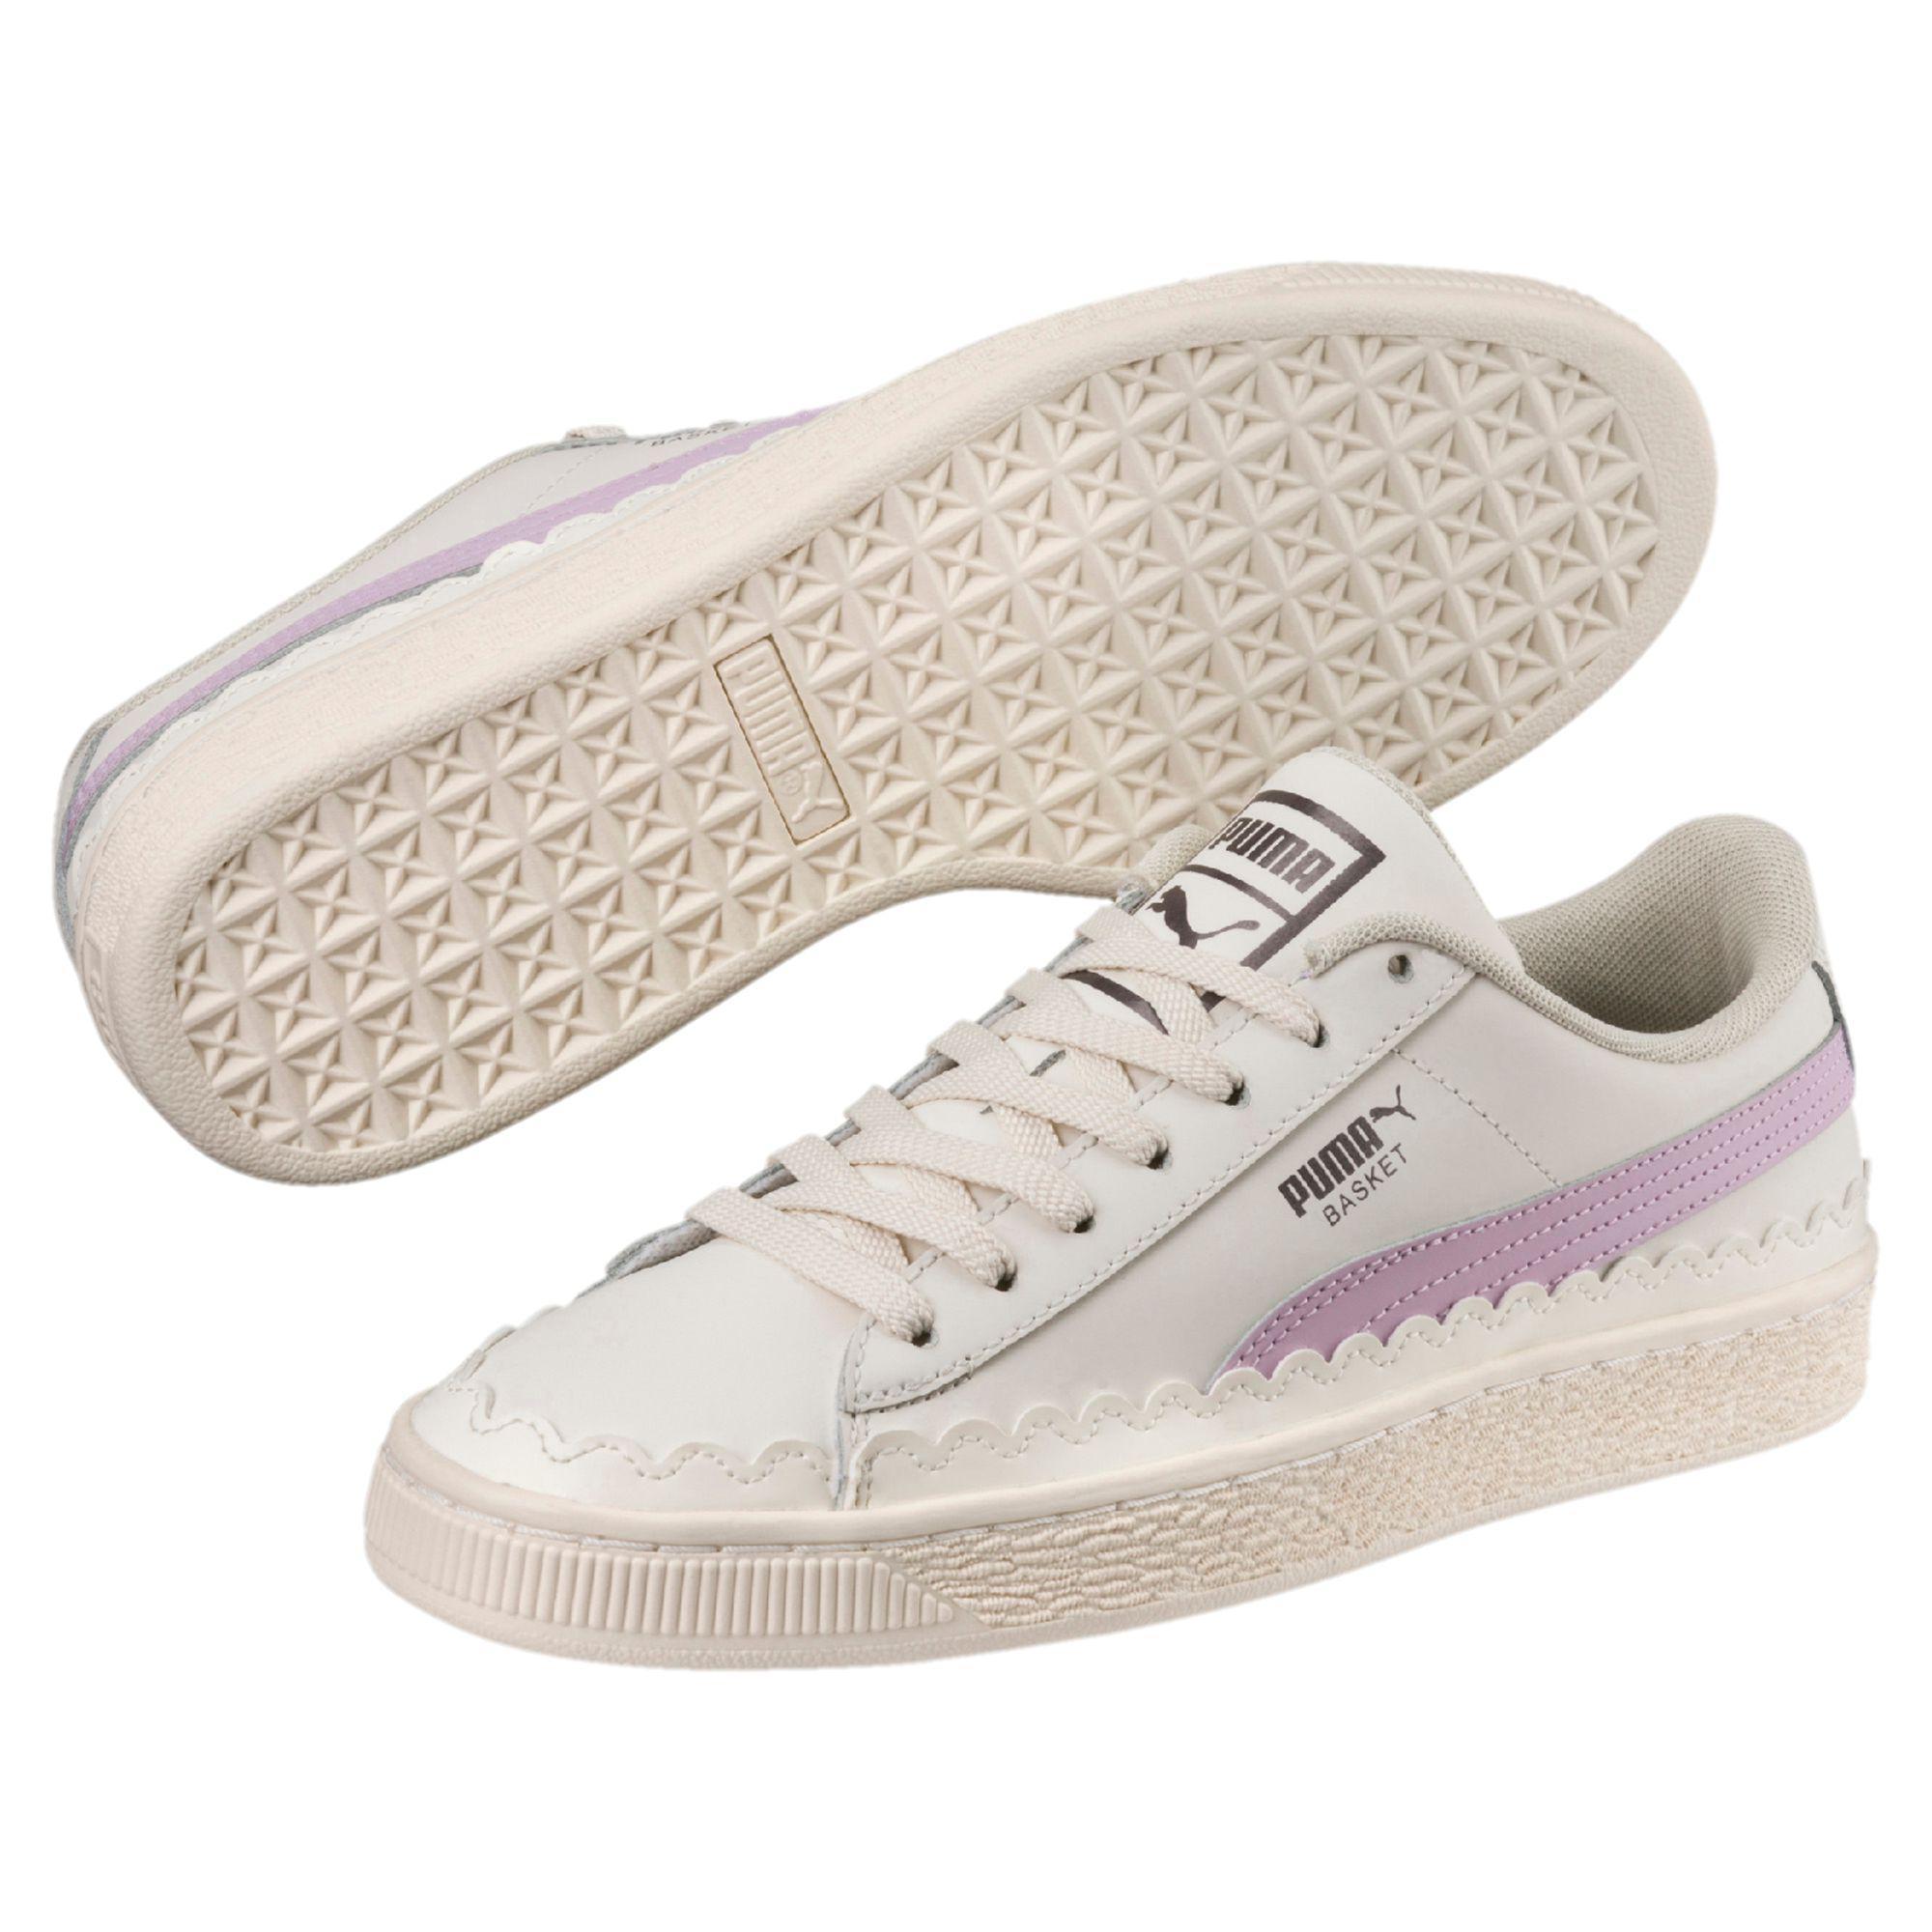 Lyst - PUMA Basket Scallop Women s Sneakers in White 21bfb323e149